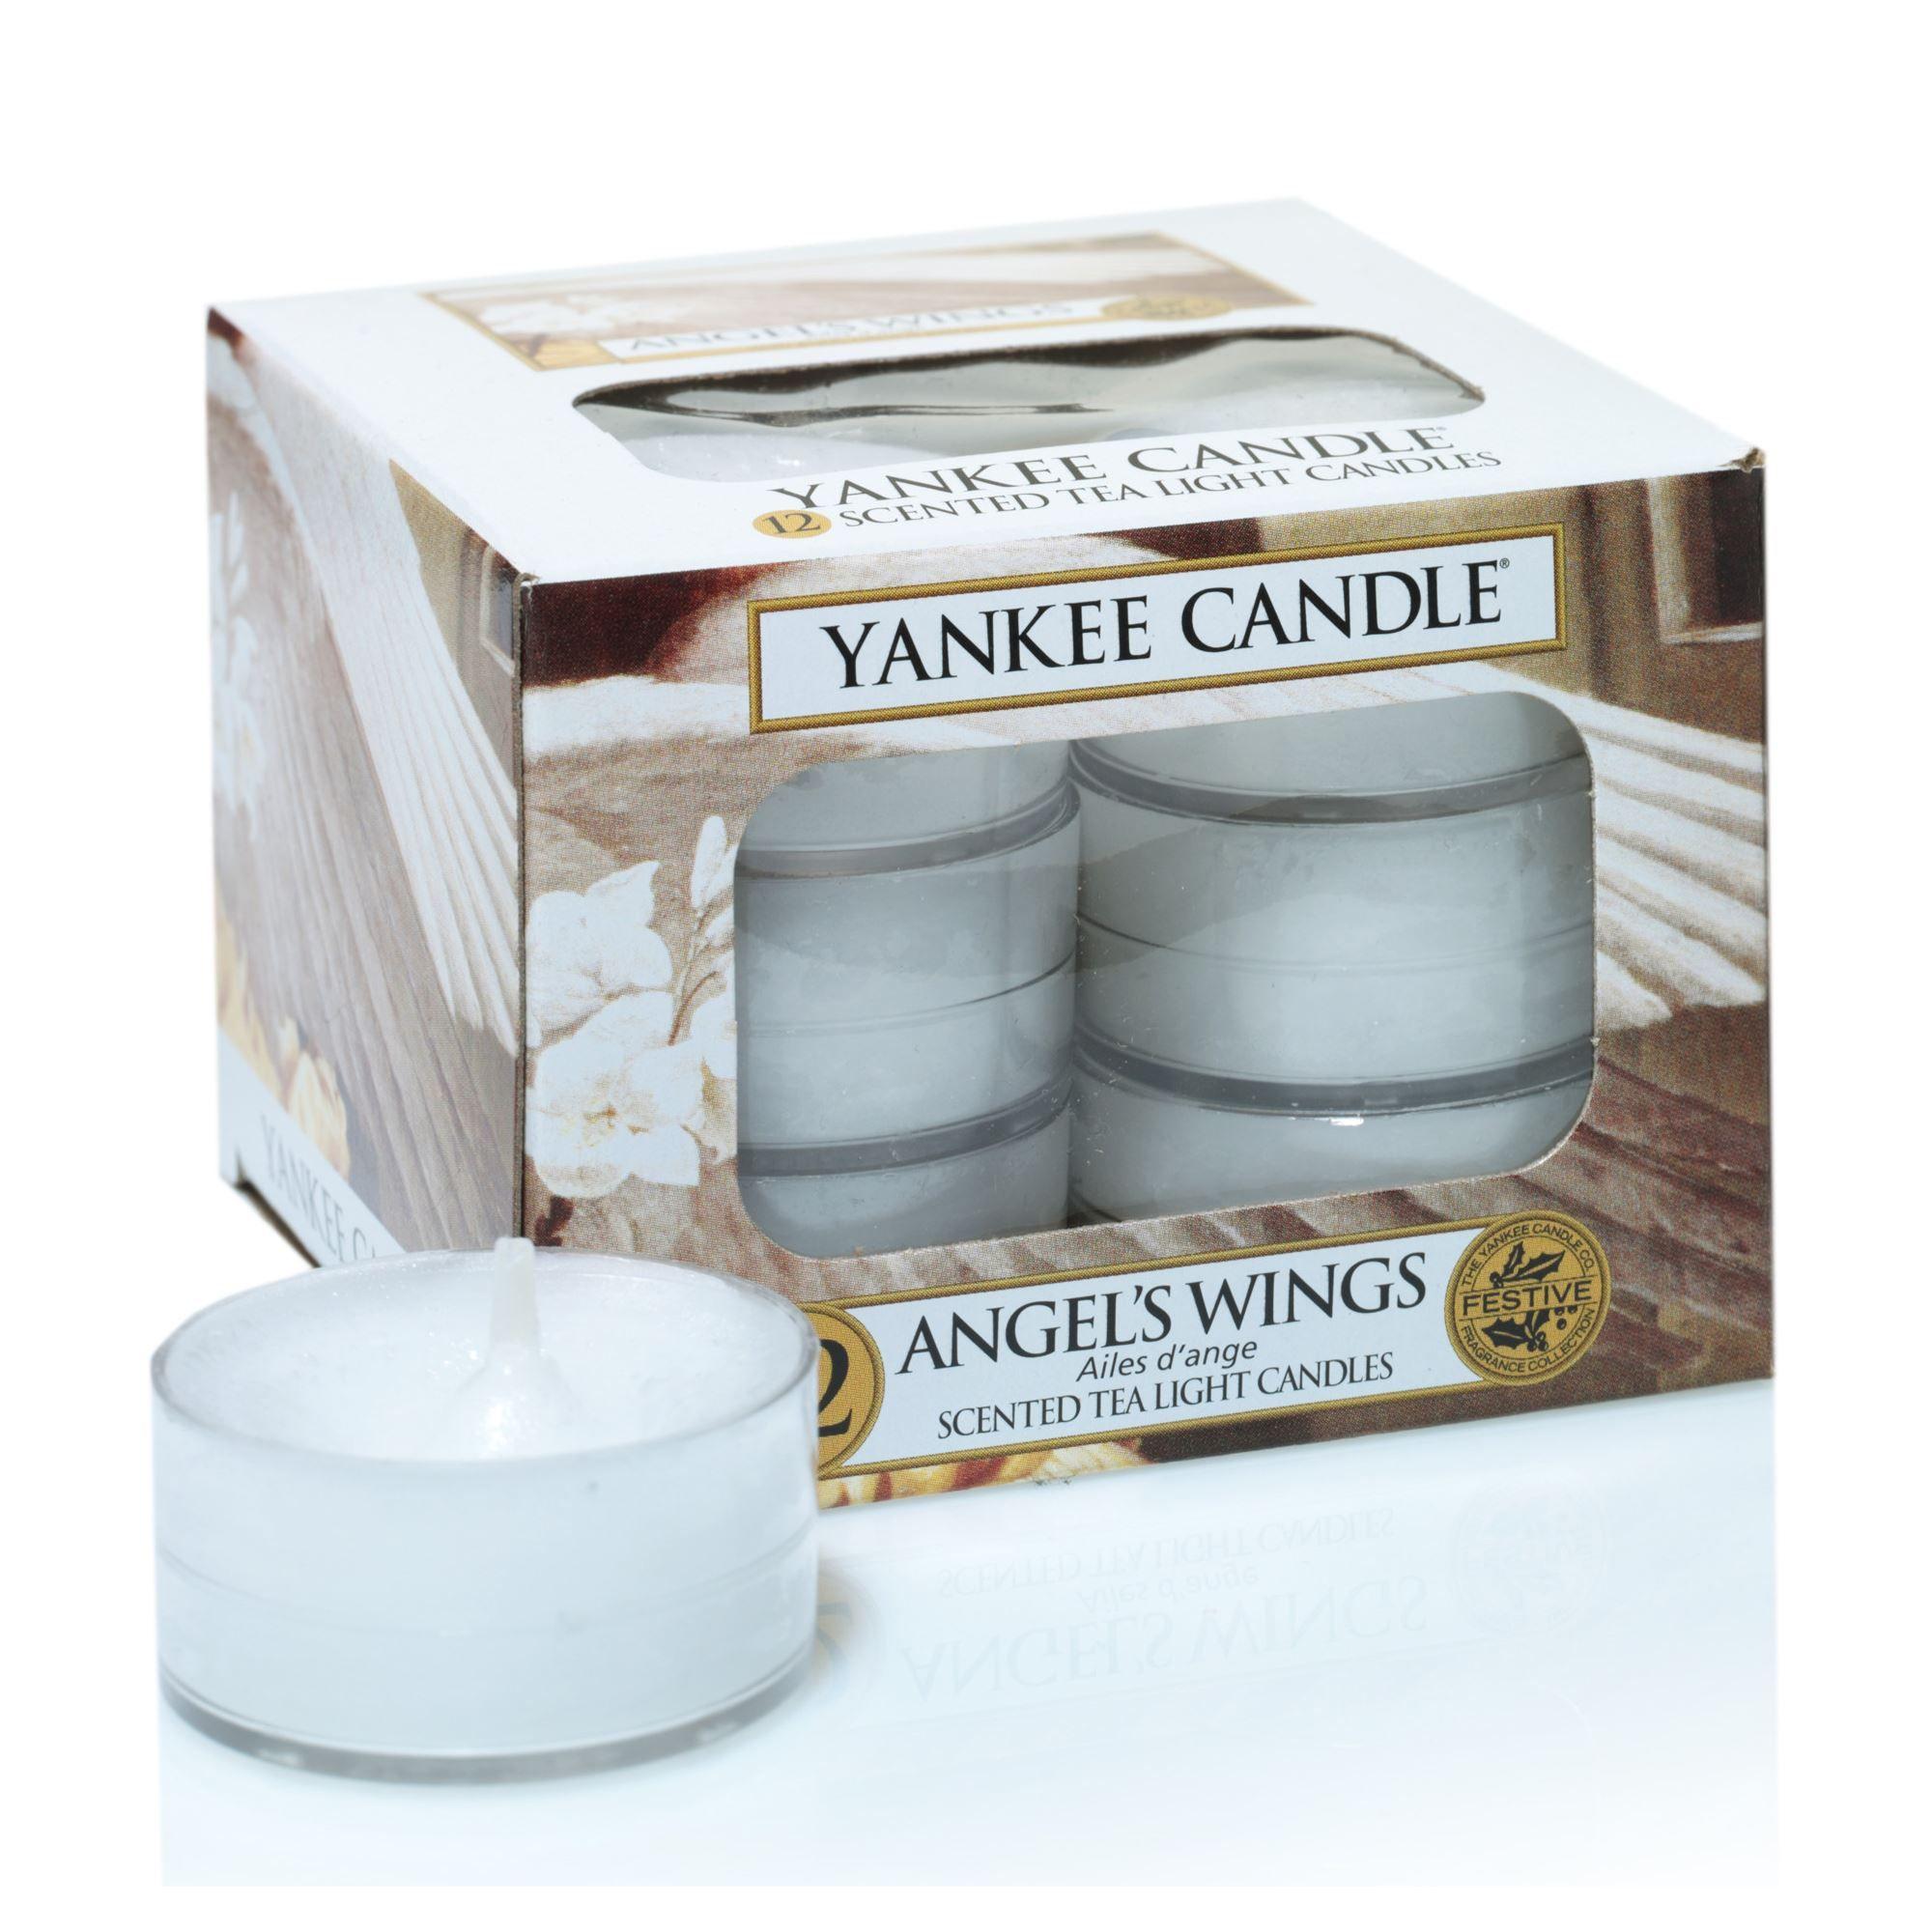 Yankee Candle Teelichter ANGEL'S WINGS